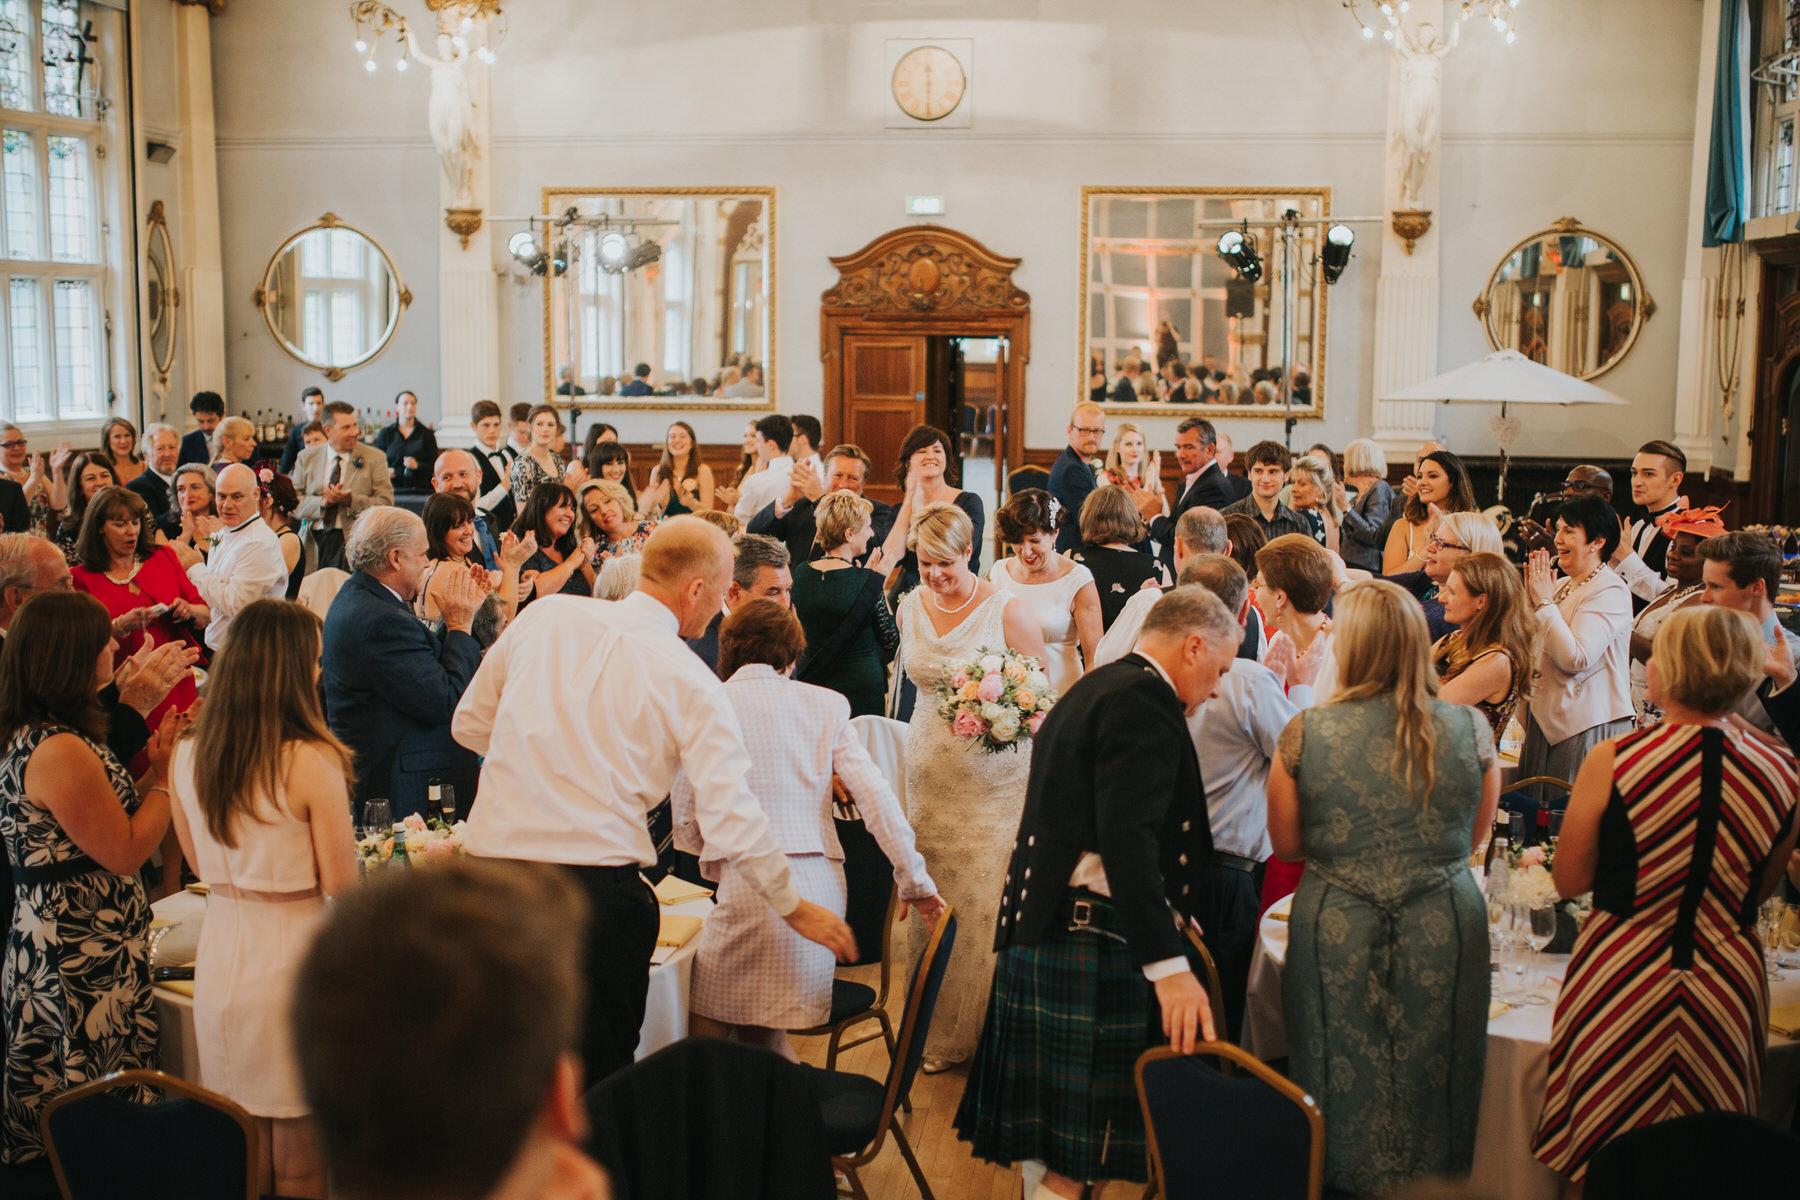 217 two brides enter Grand Hall wedding reception.jpg